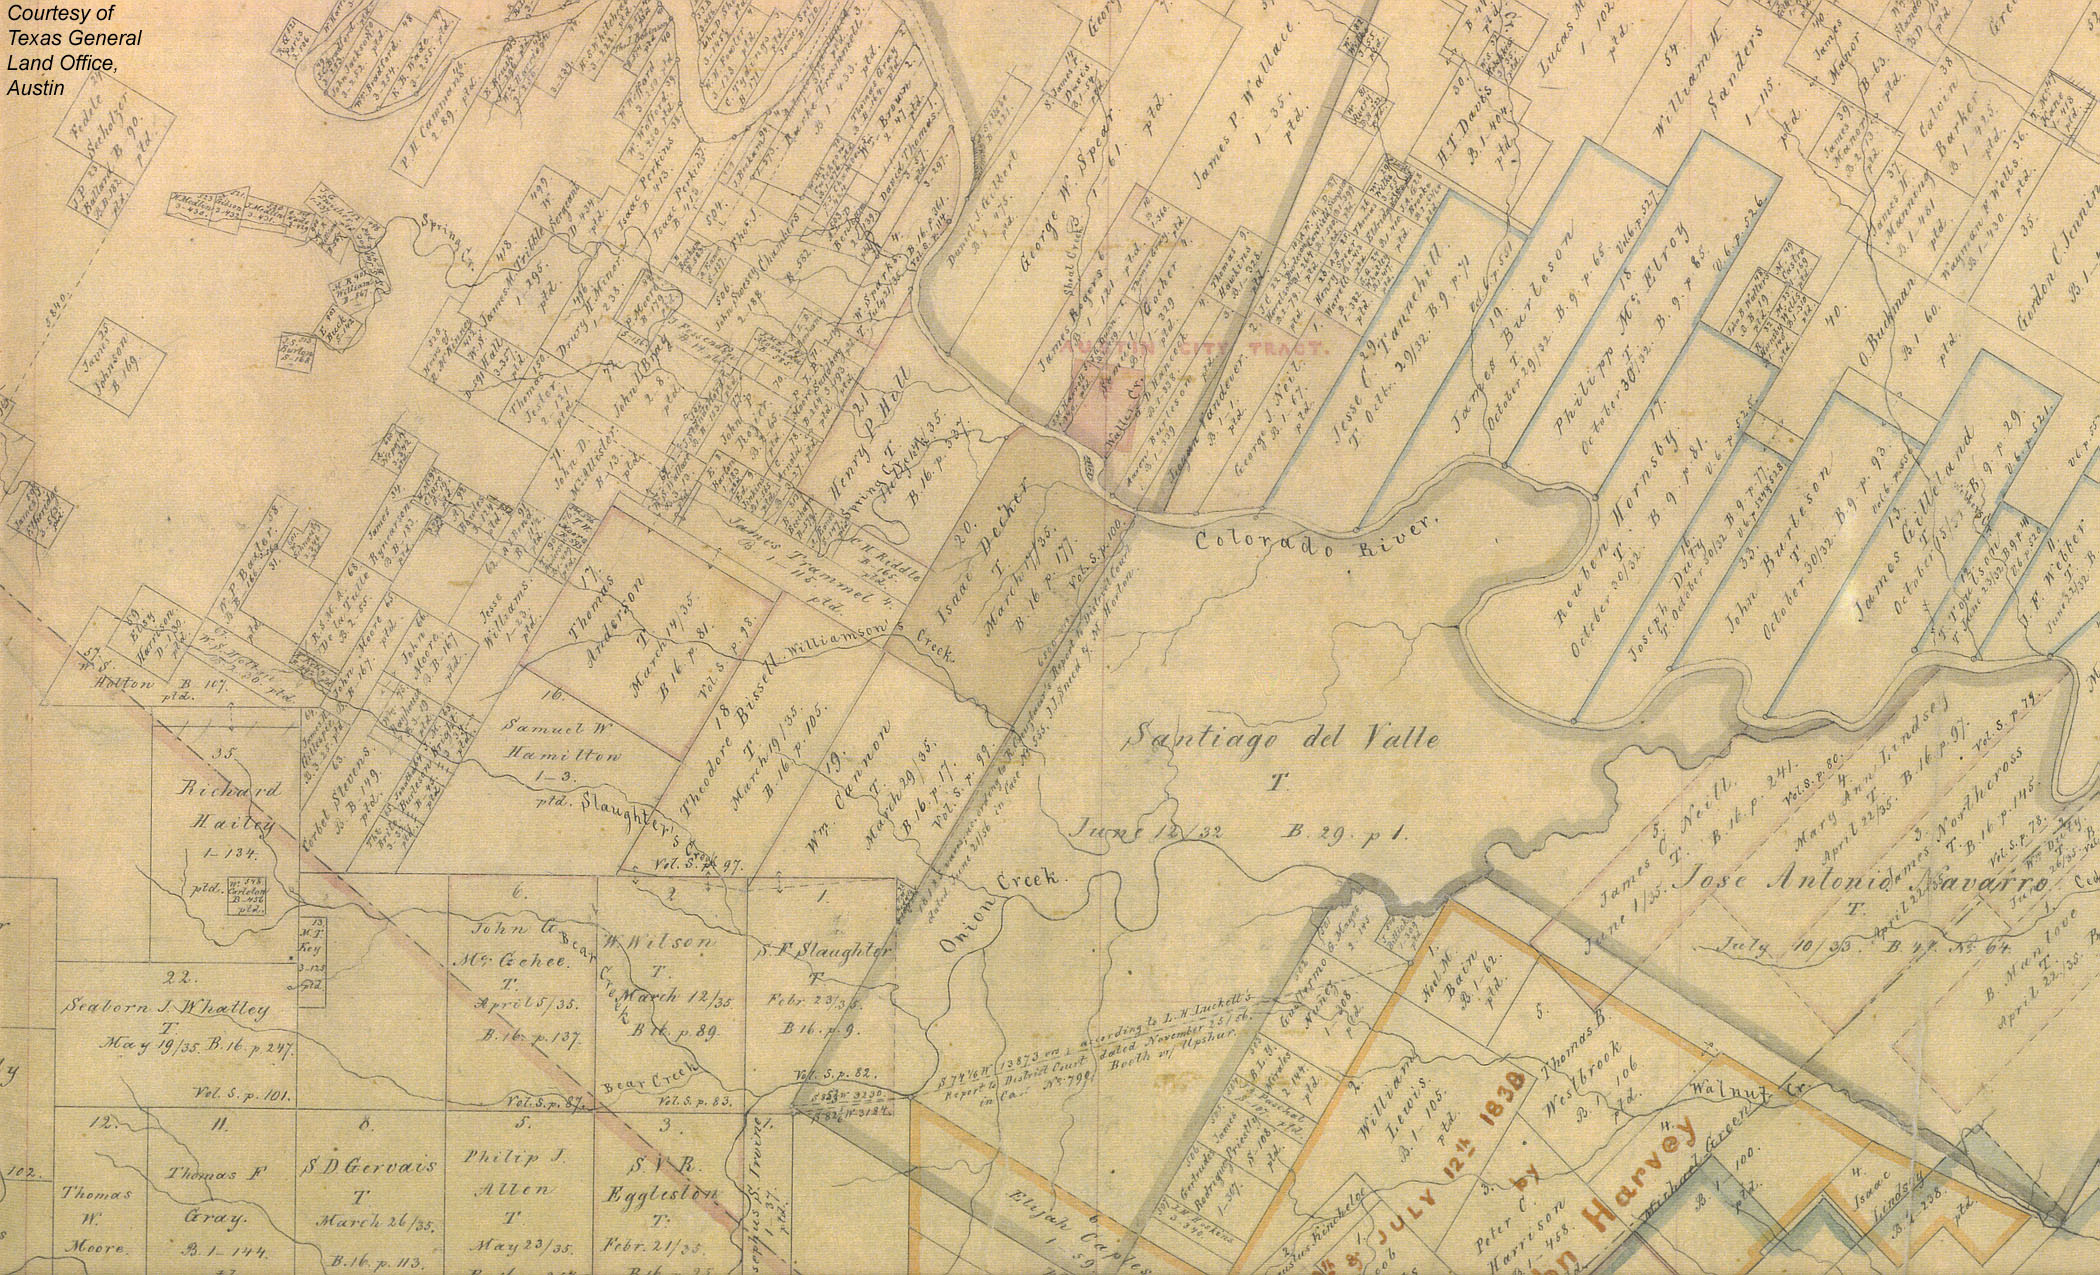 Historical Maps Of Austin Bryker Woods Neighborhood - Property line survey map